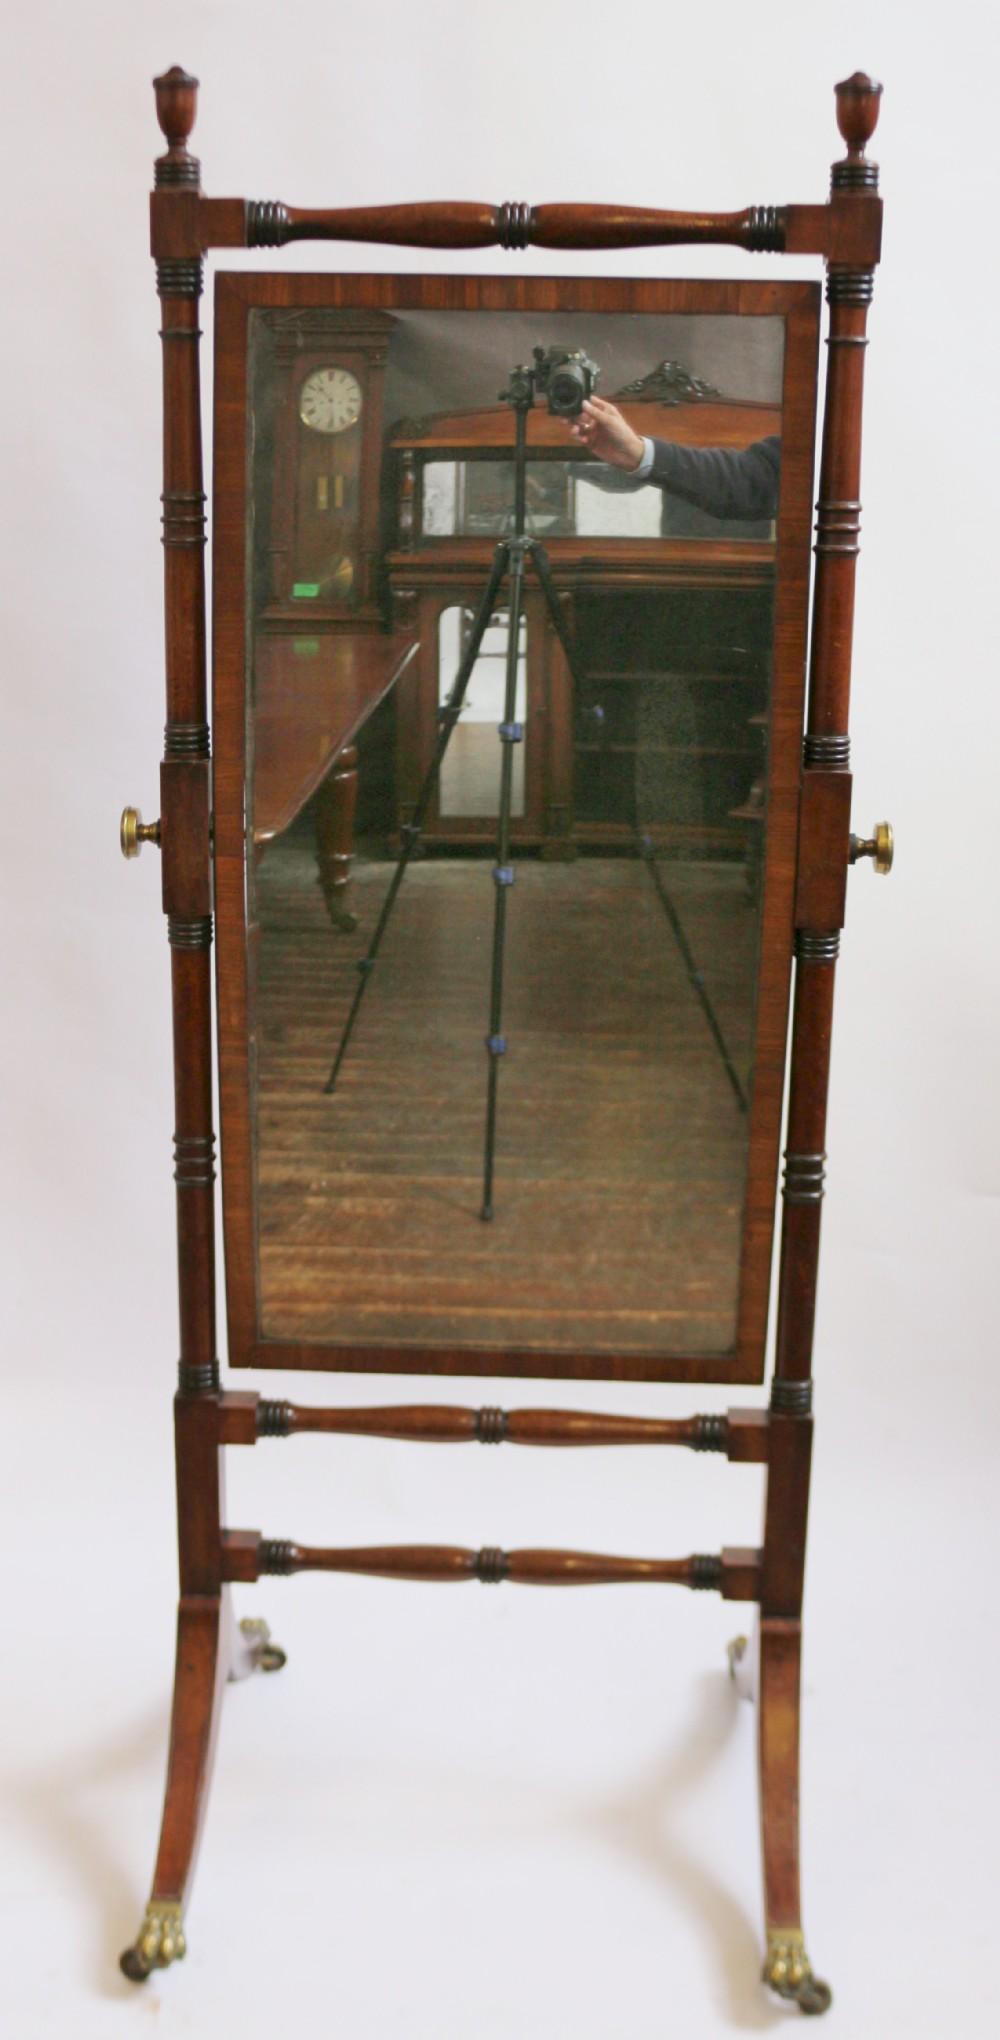 regency mahogany cheval mirror within turned frame